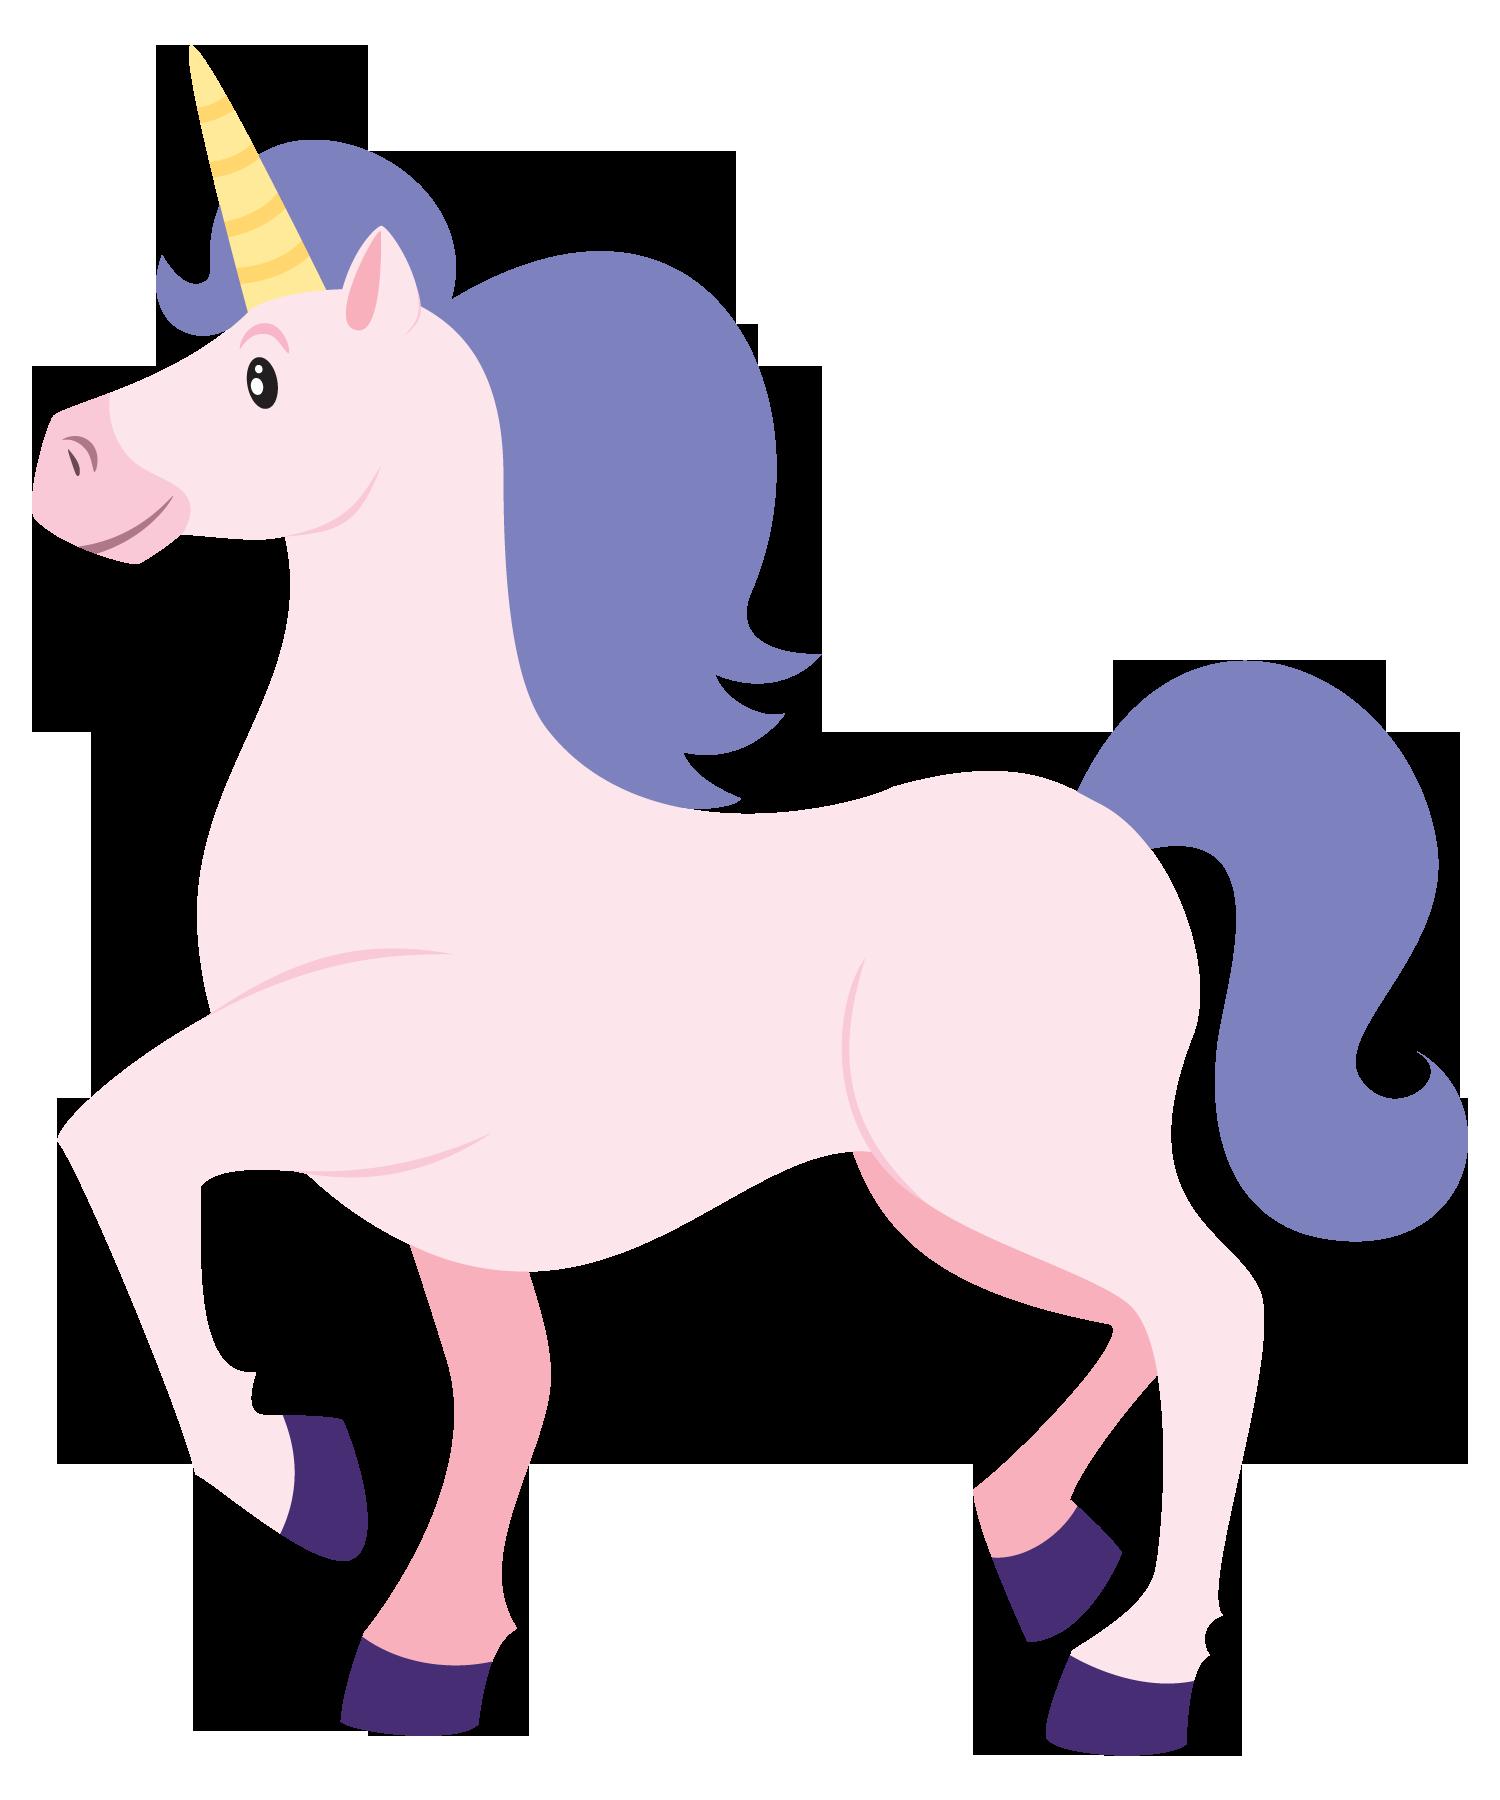 12 Unicorn Cartoon Free Cliparts That Yo-12 Unicorn Cartoon Free Cliparts That You Can Download To You-0